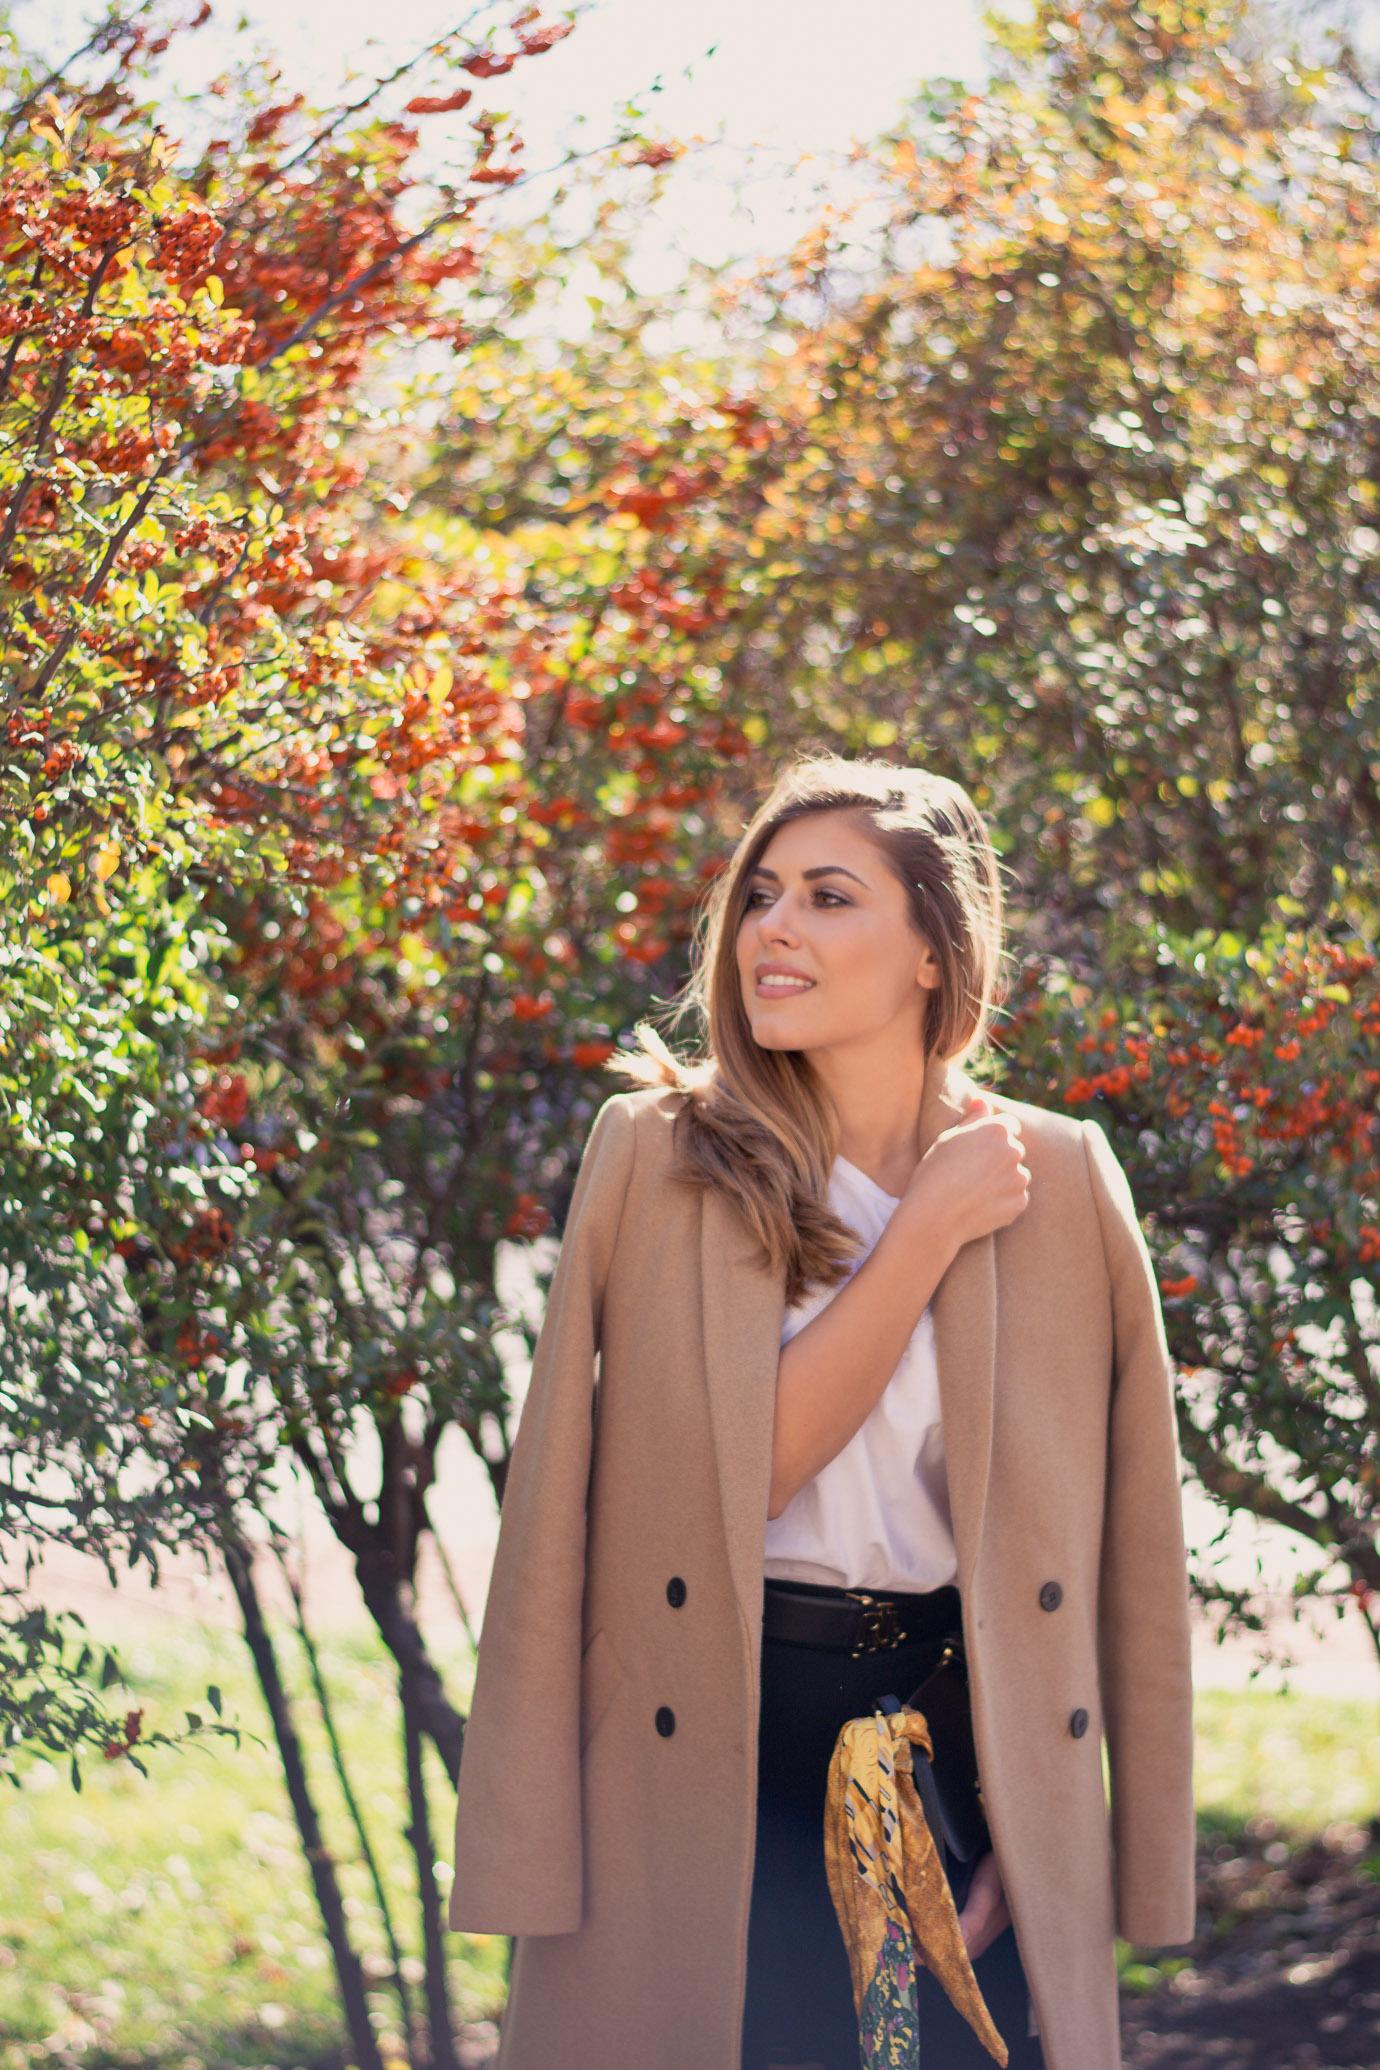 Beauty fashion blogger Denina Martin